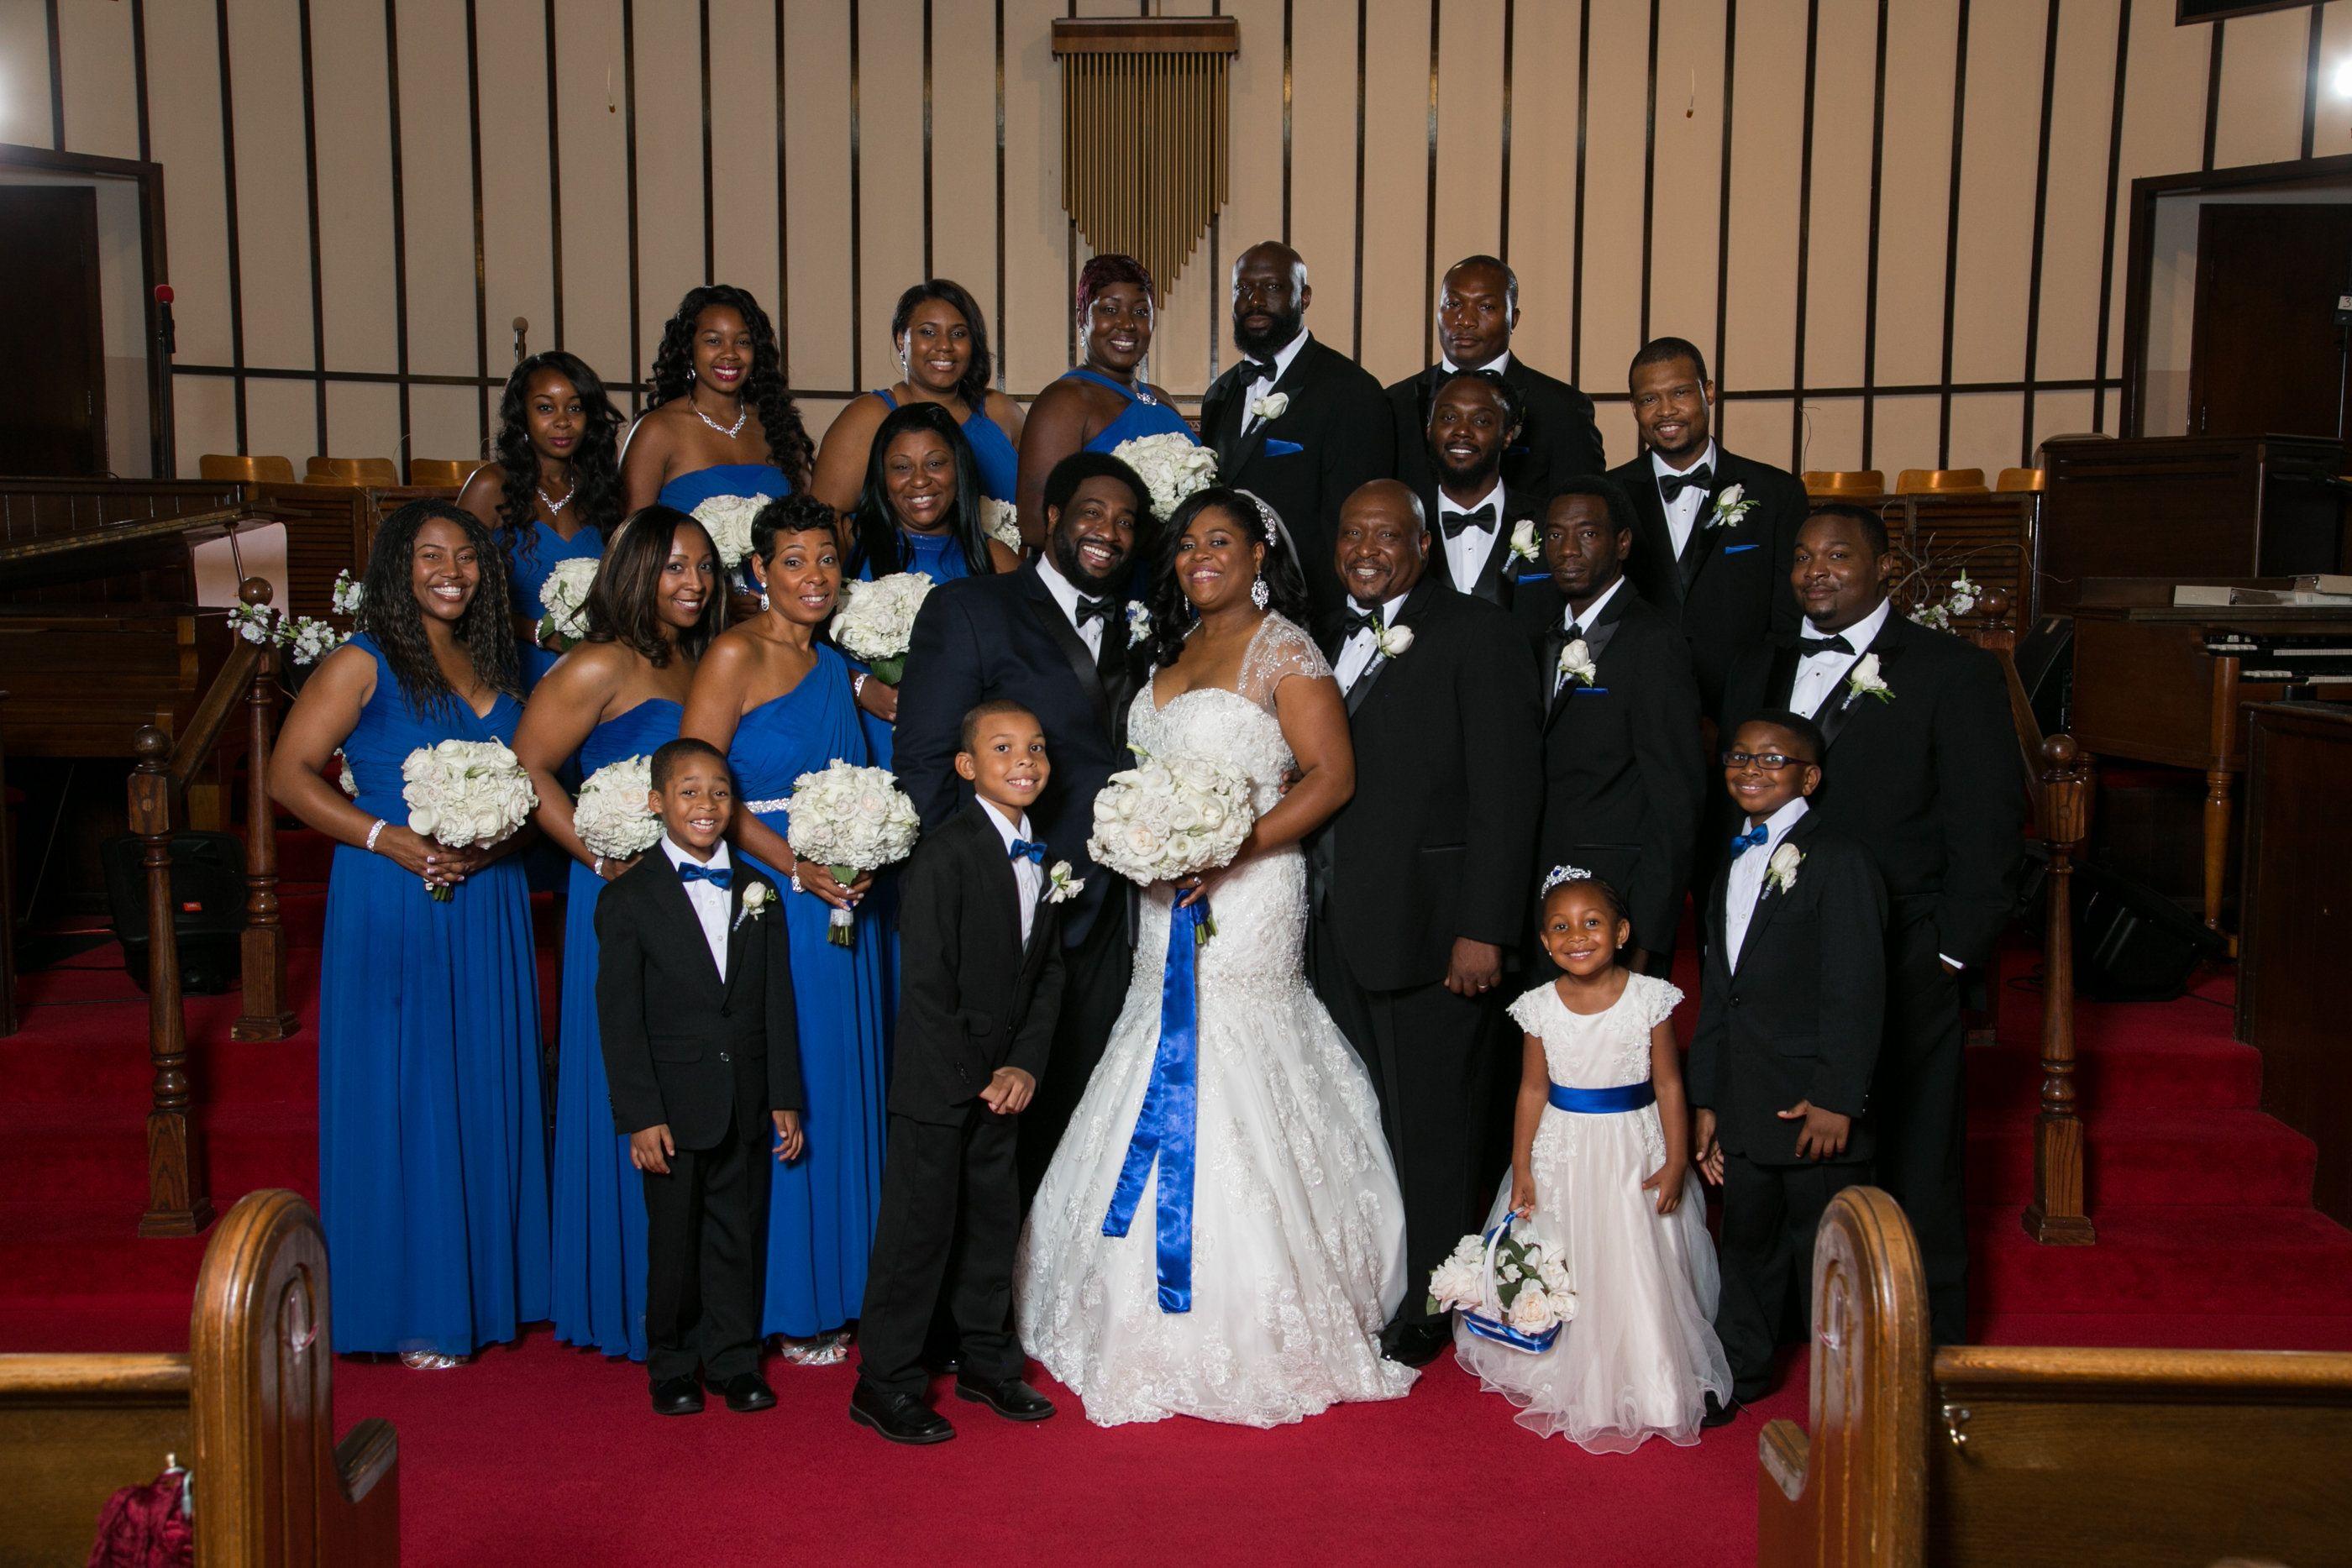 Royal blue white wedding bridal wedding party royal blue royal blue white wedding bridal wedding party royal blue bridesmaids dresses dessy collection ombrellifo Images